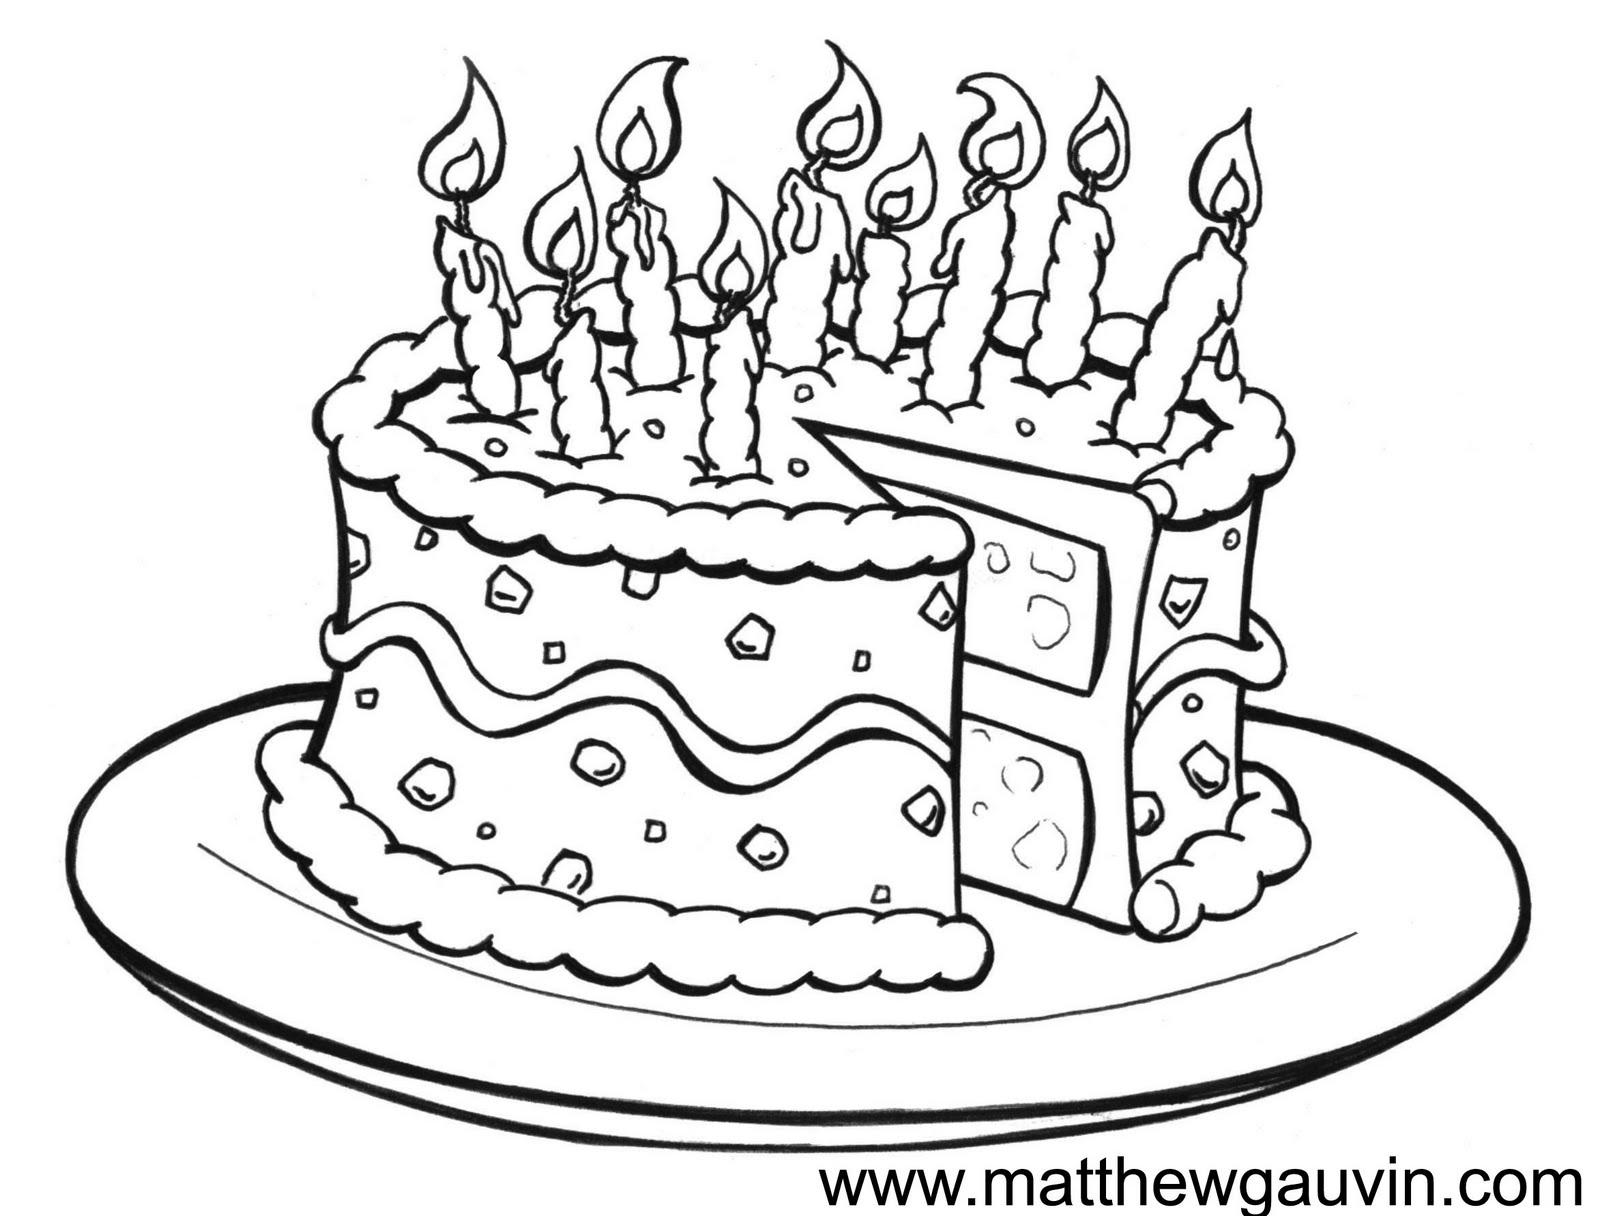 Mg Children S Book Illustrations Birthday Cake Line Drawing